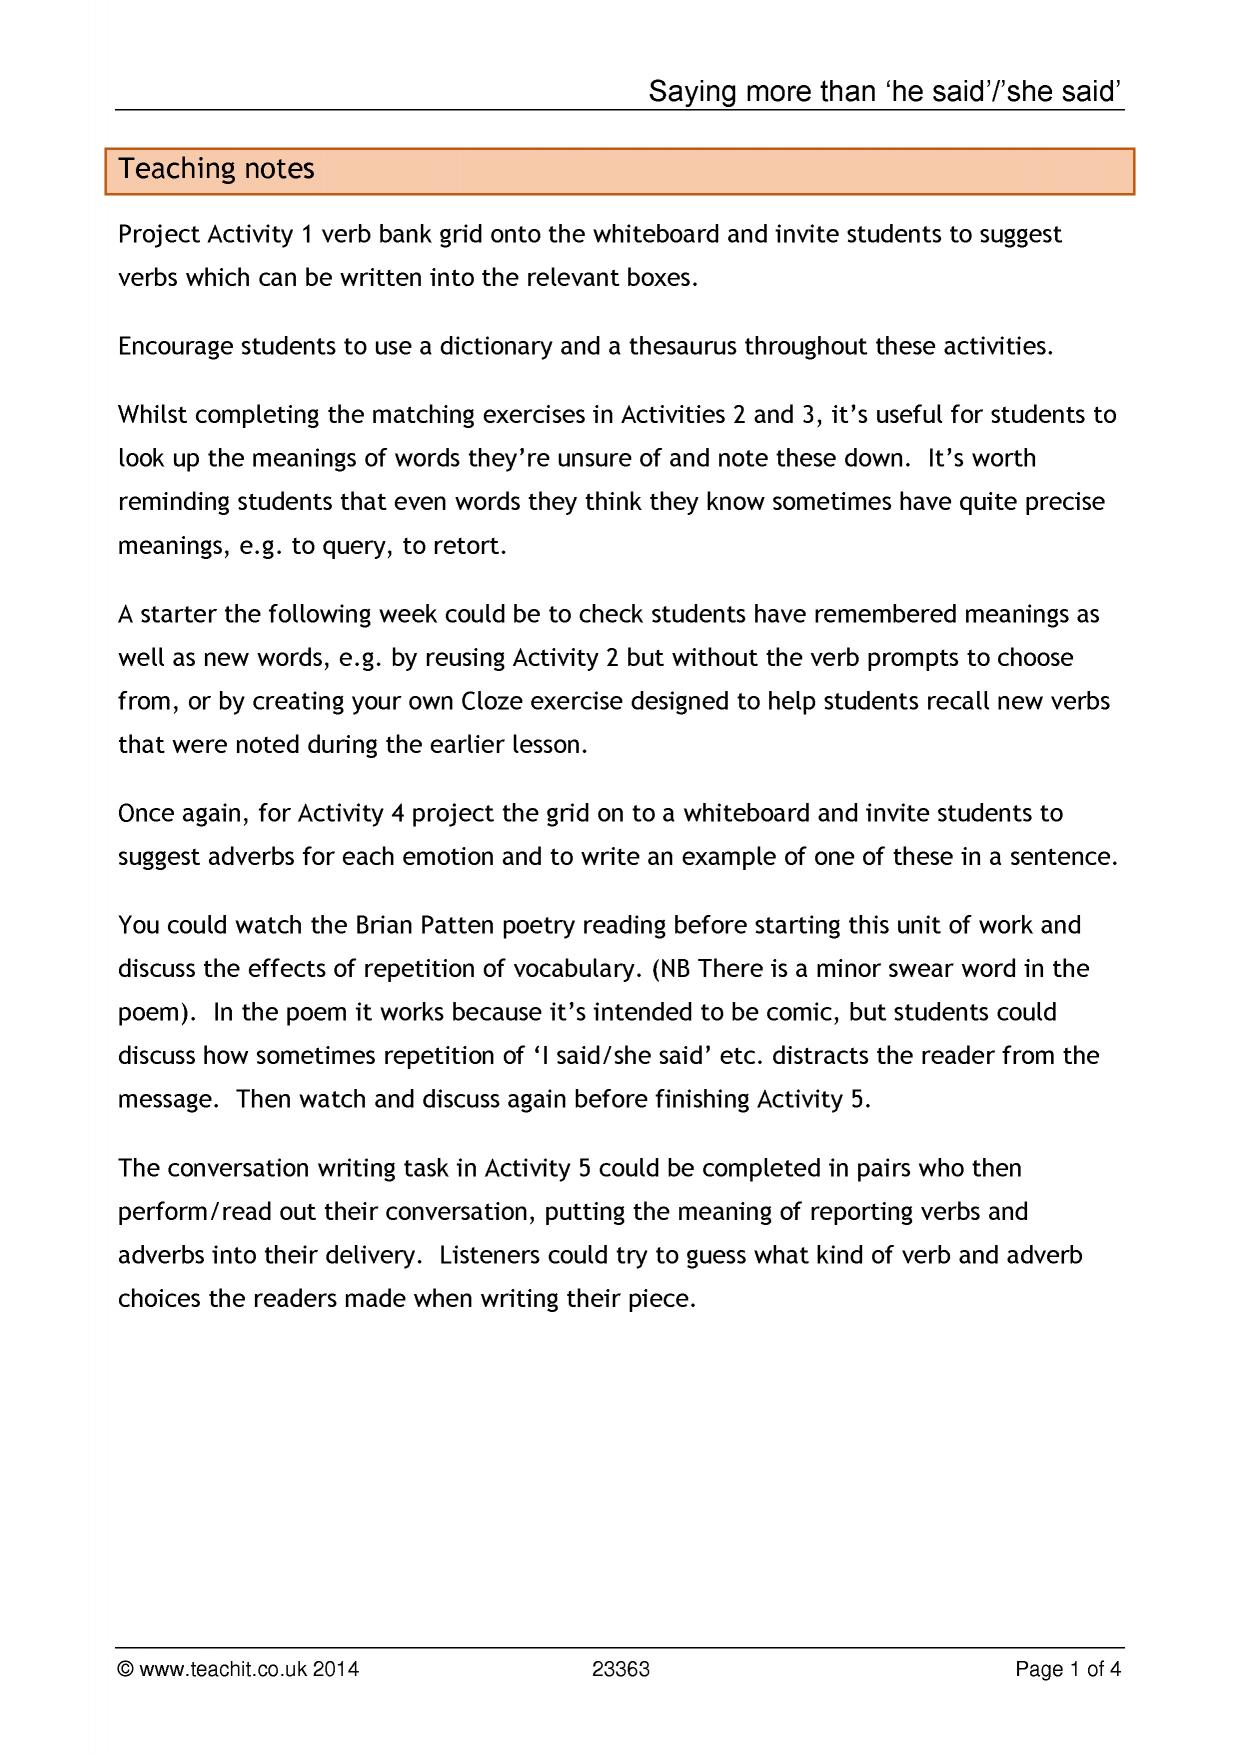 Creative writing resources ks4